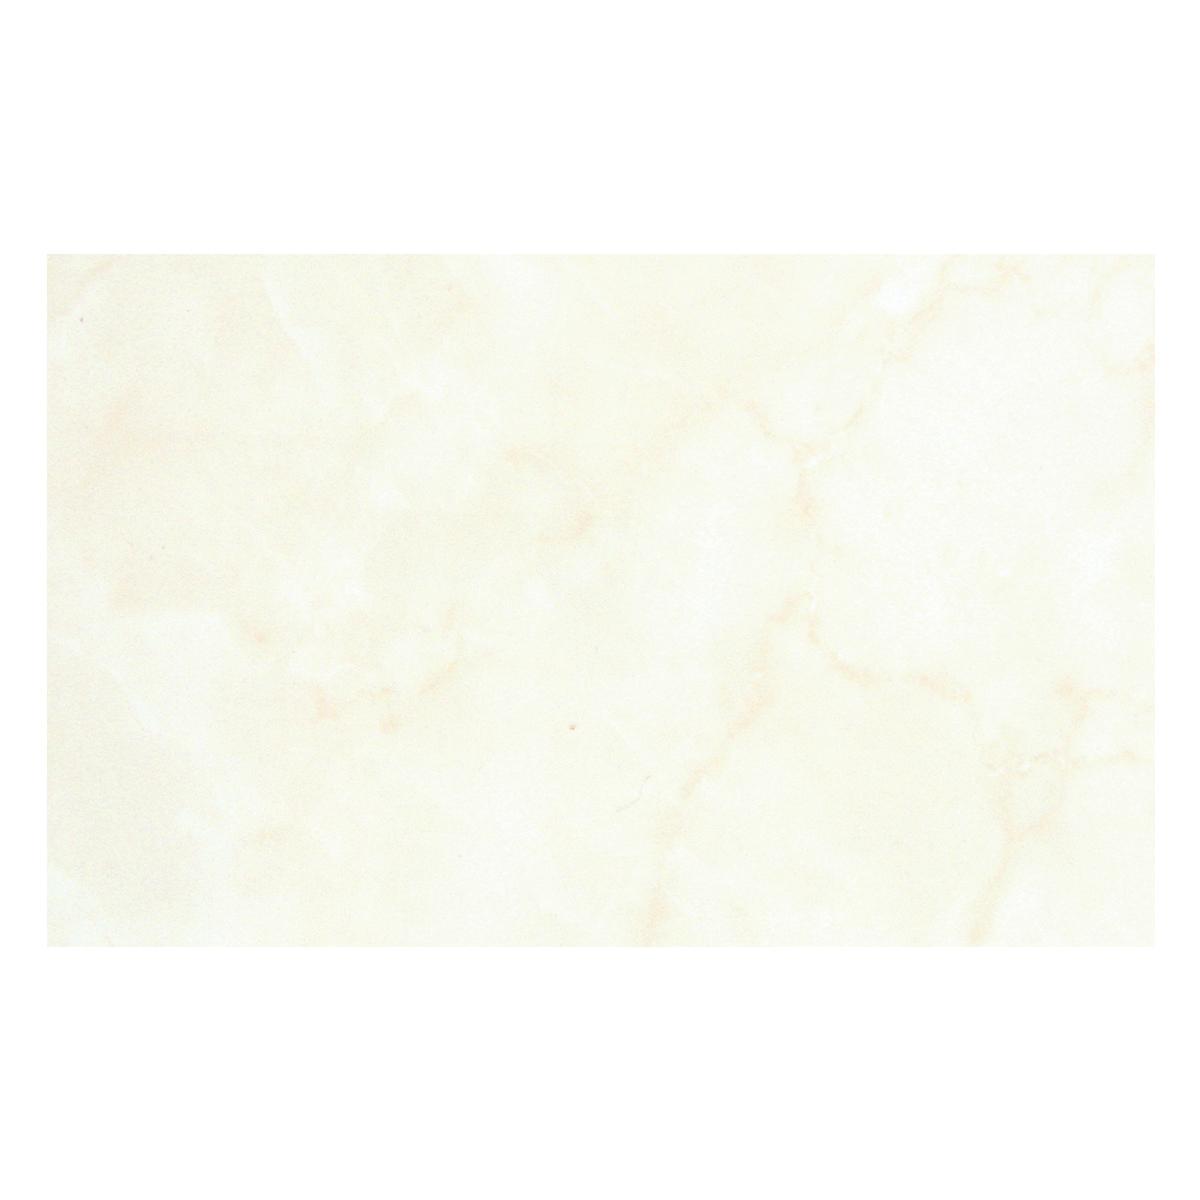 Mayólica Orion Beige Brillante - 25X40 cm - 1.83 m2